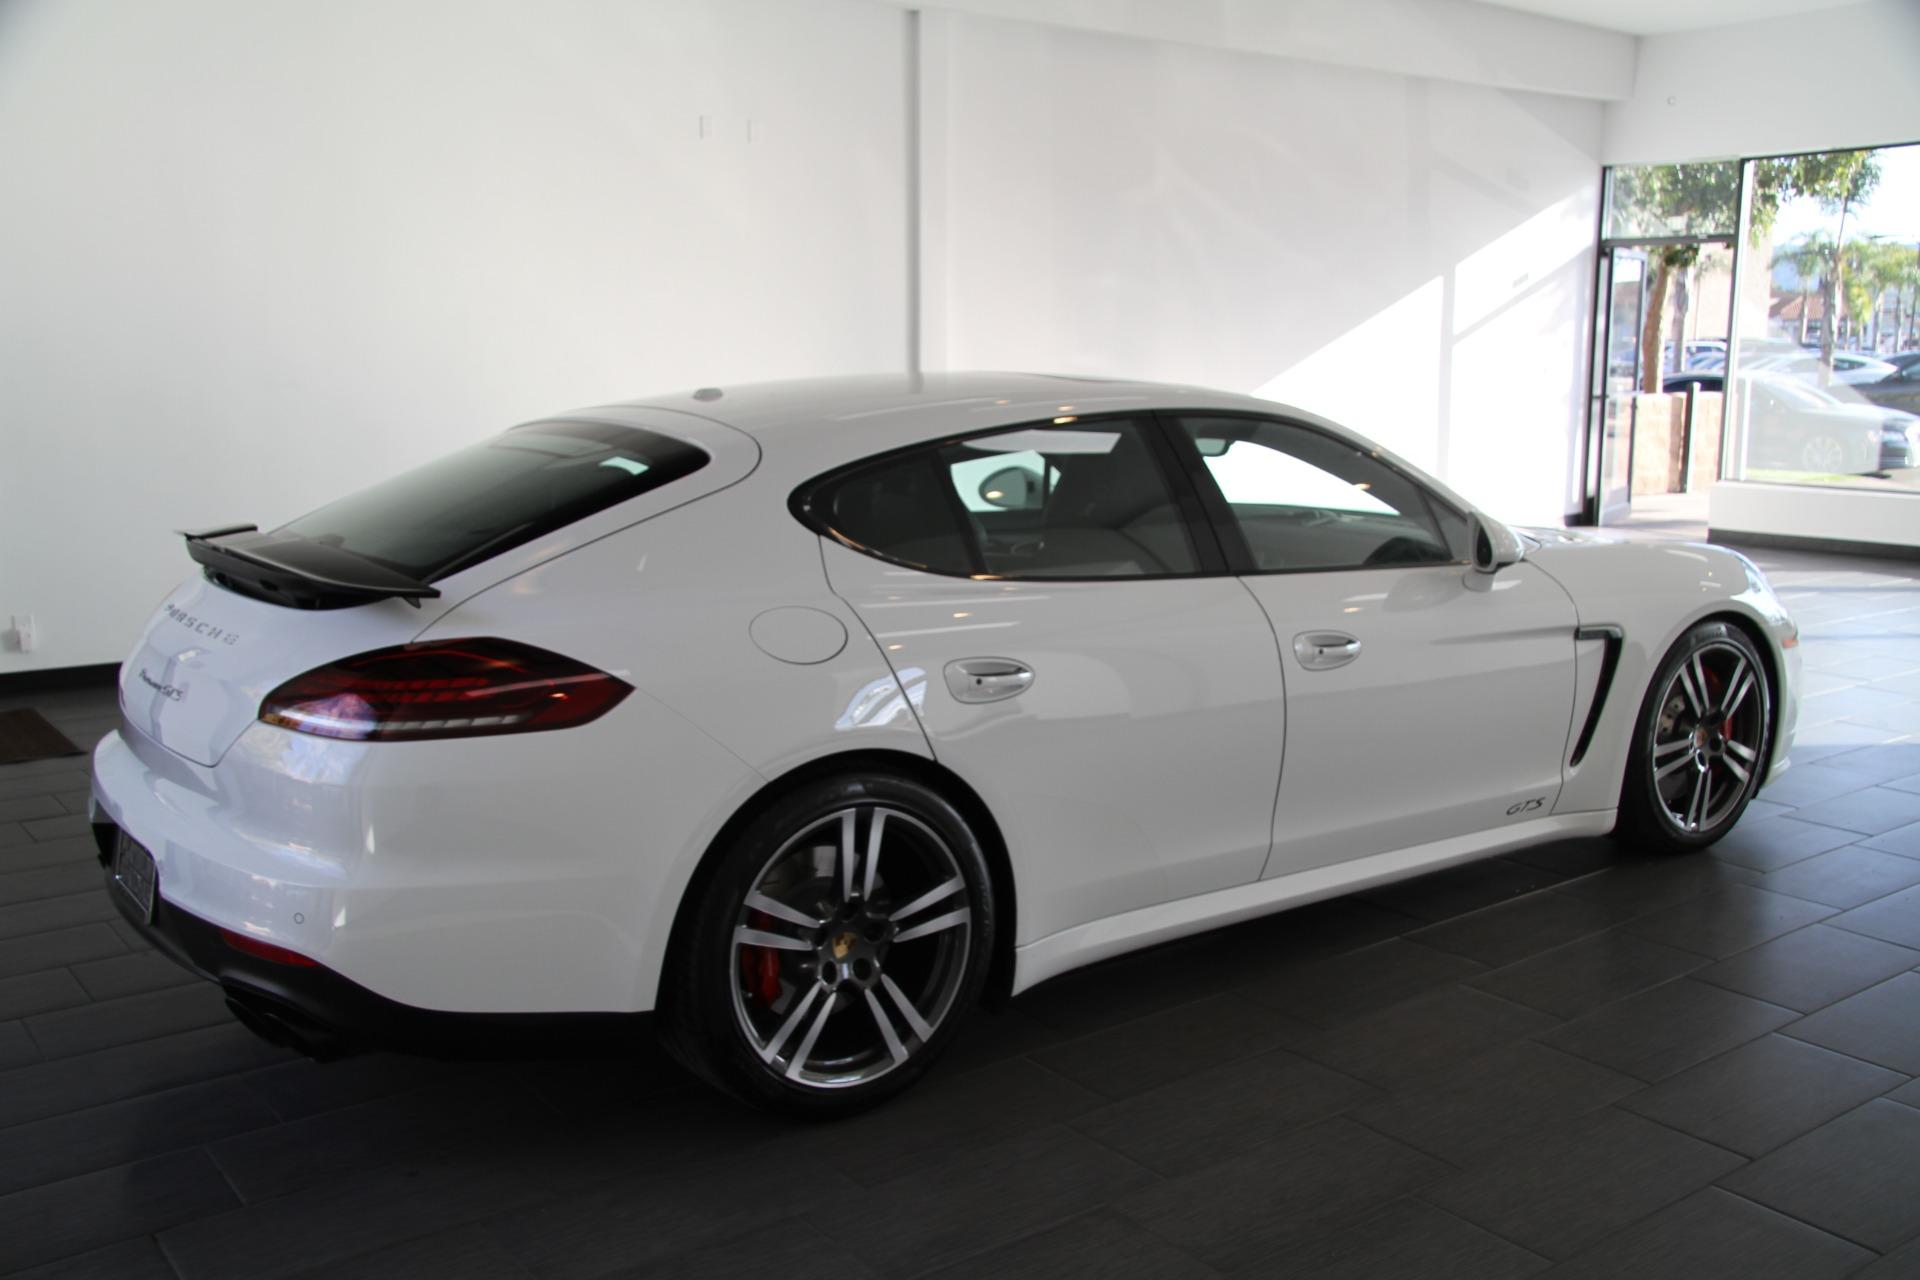 2015 Porsche Panamera Gts Msrp 125 125 Stock 6109 For Sale Near Redondo Beach Ca Ca Porsche Dealer